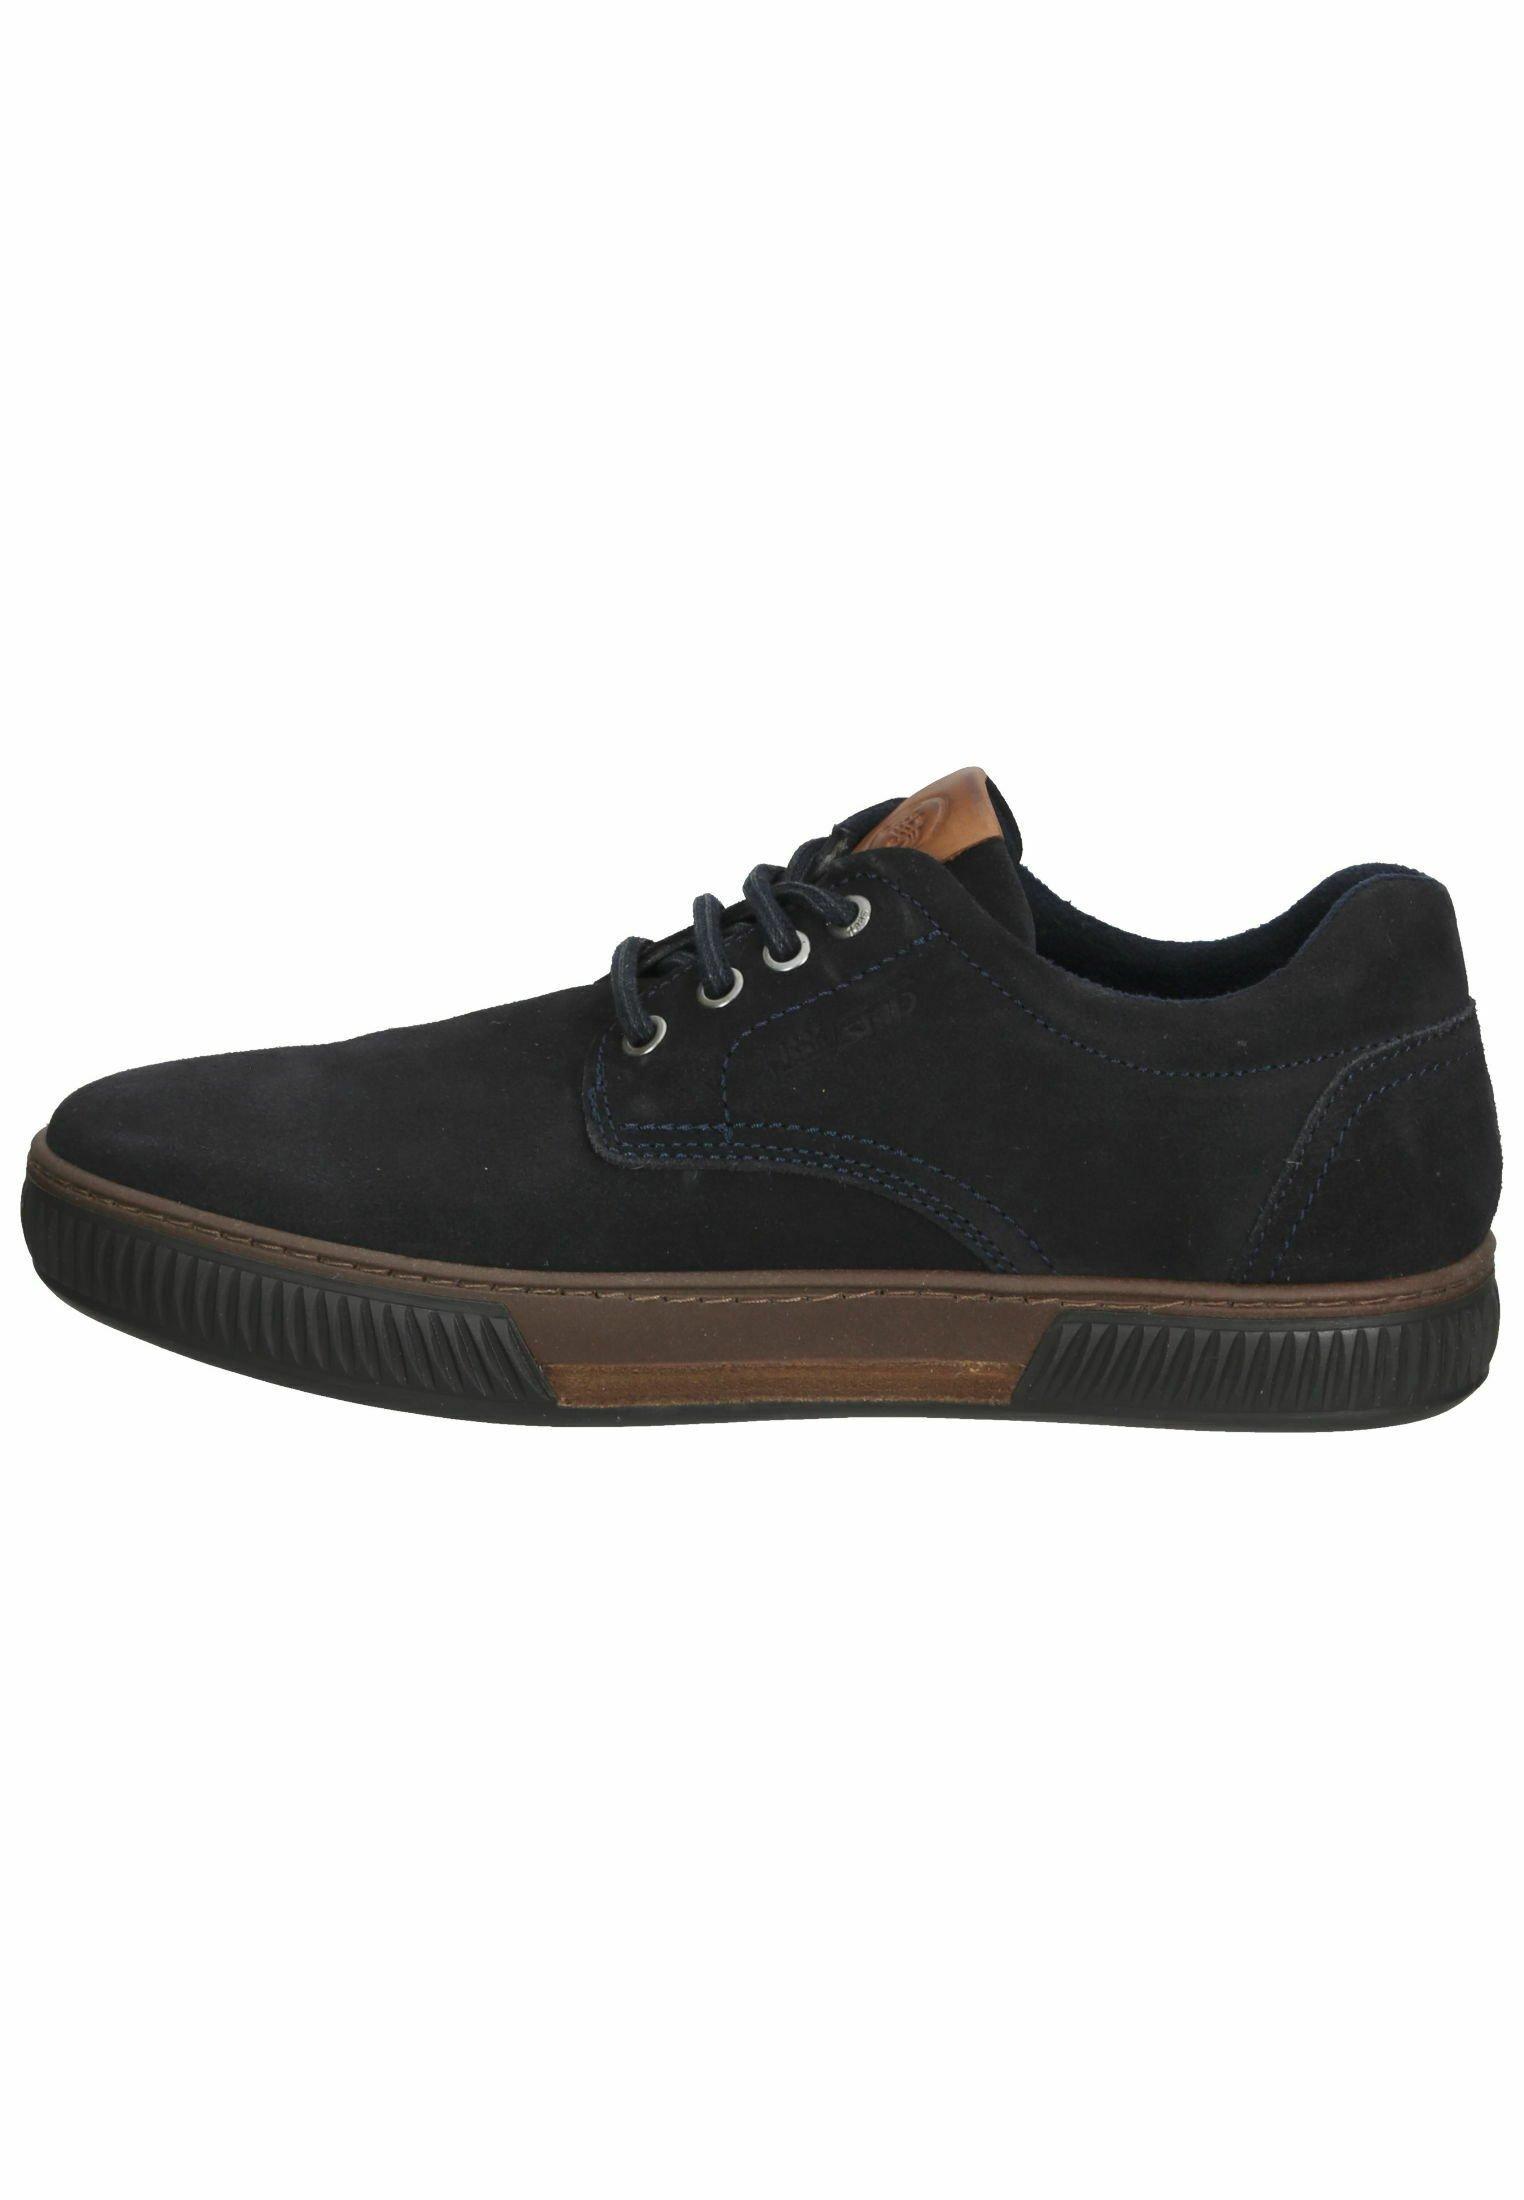 Homme Baskets basses - navy